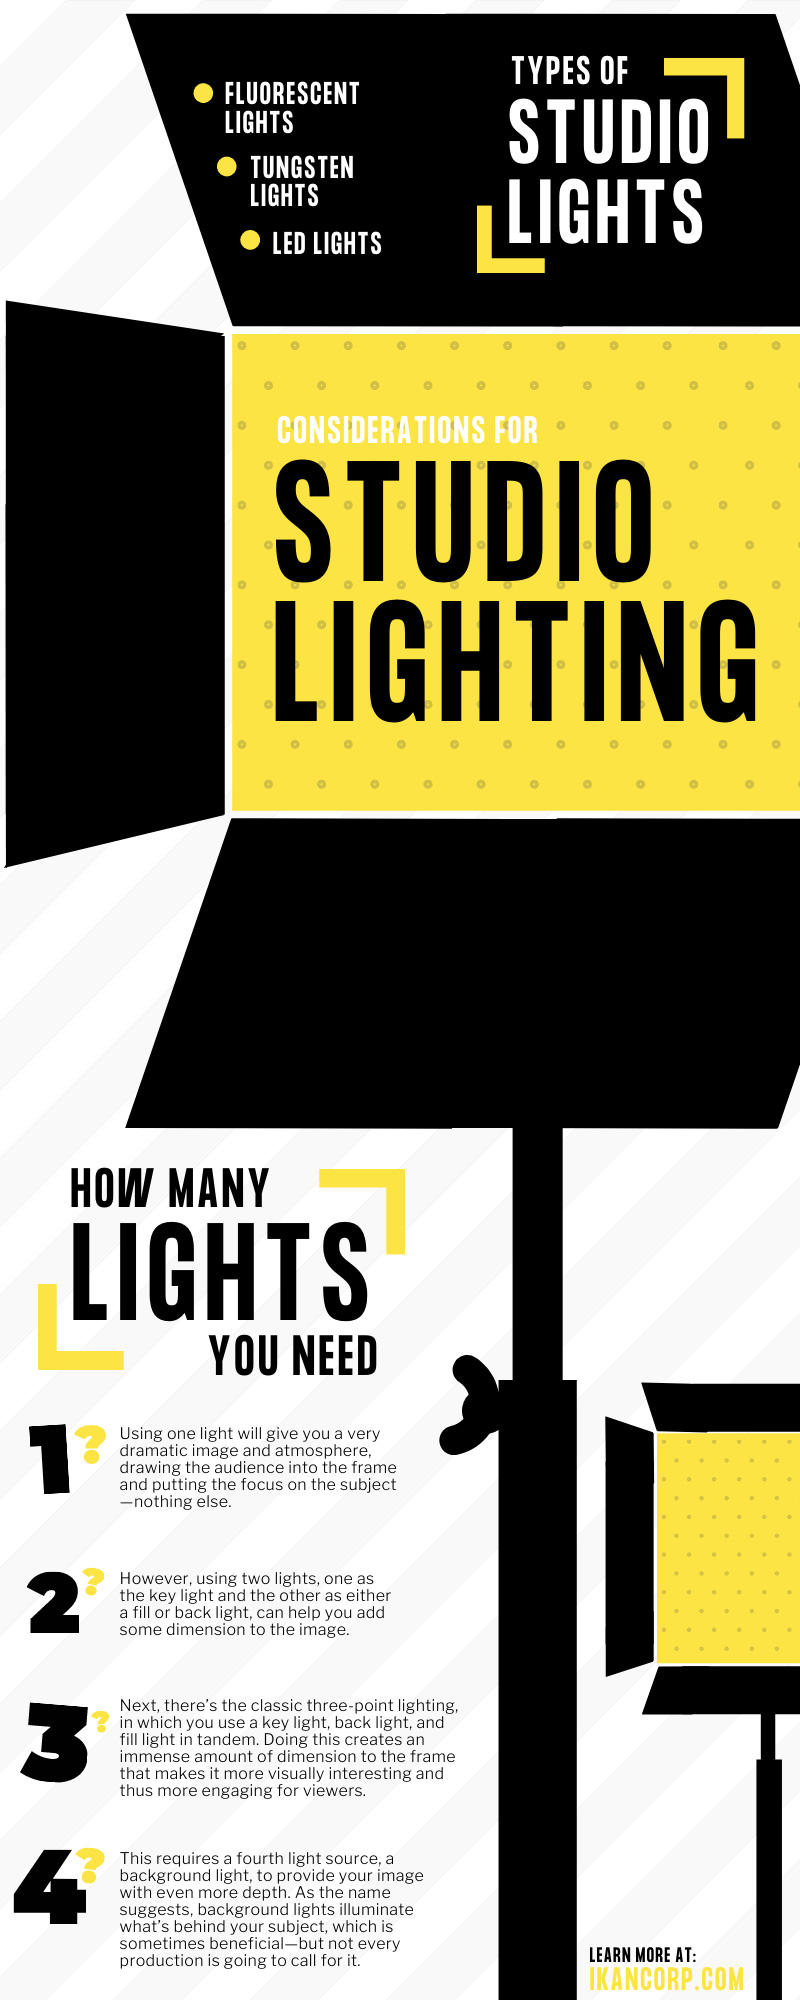 Considerations for Choosing Studio Lighting